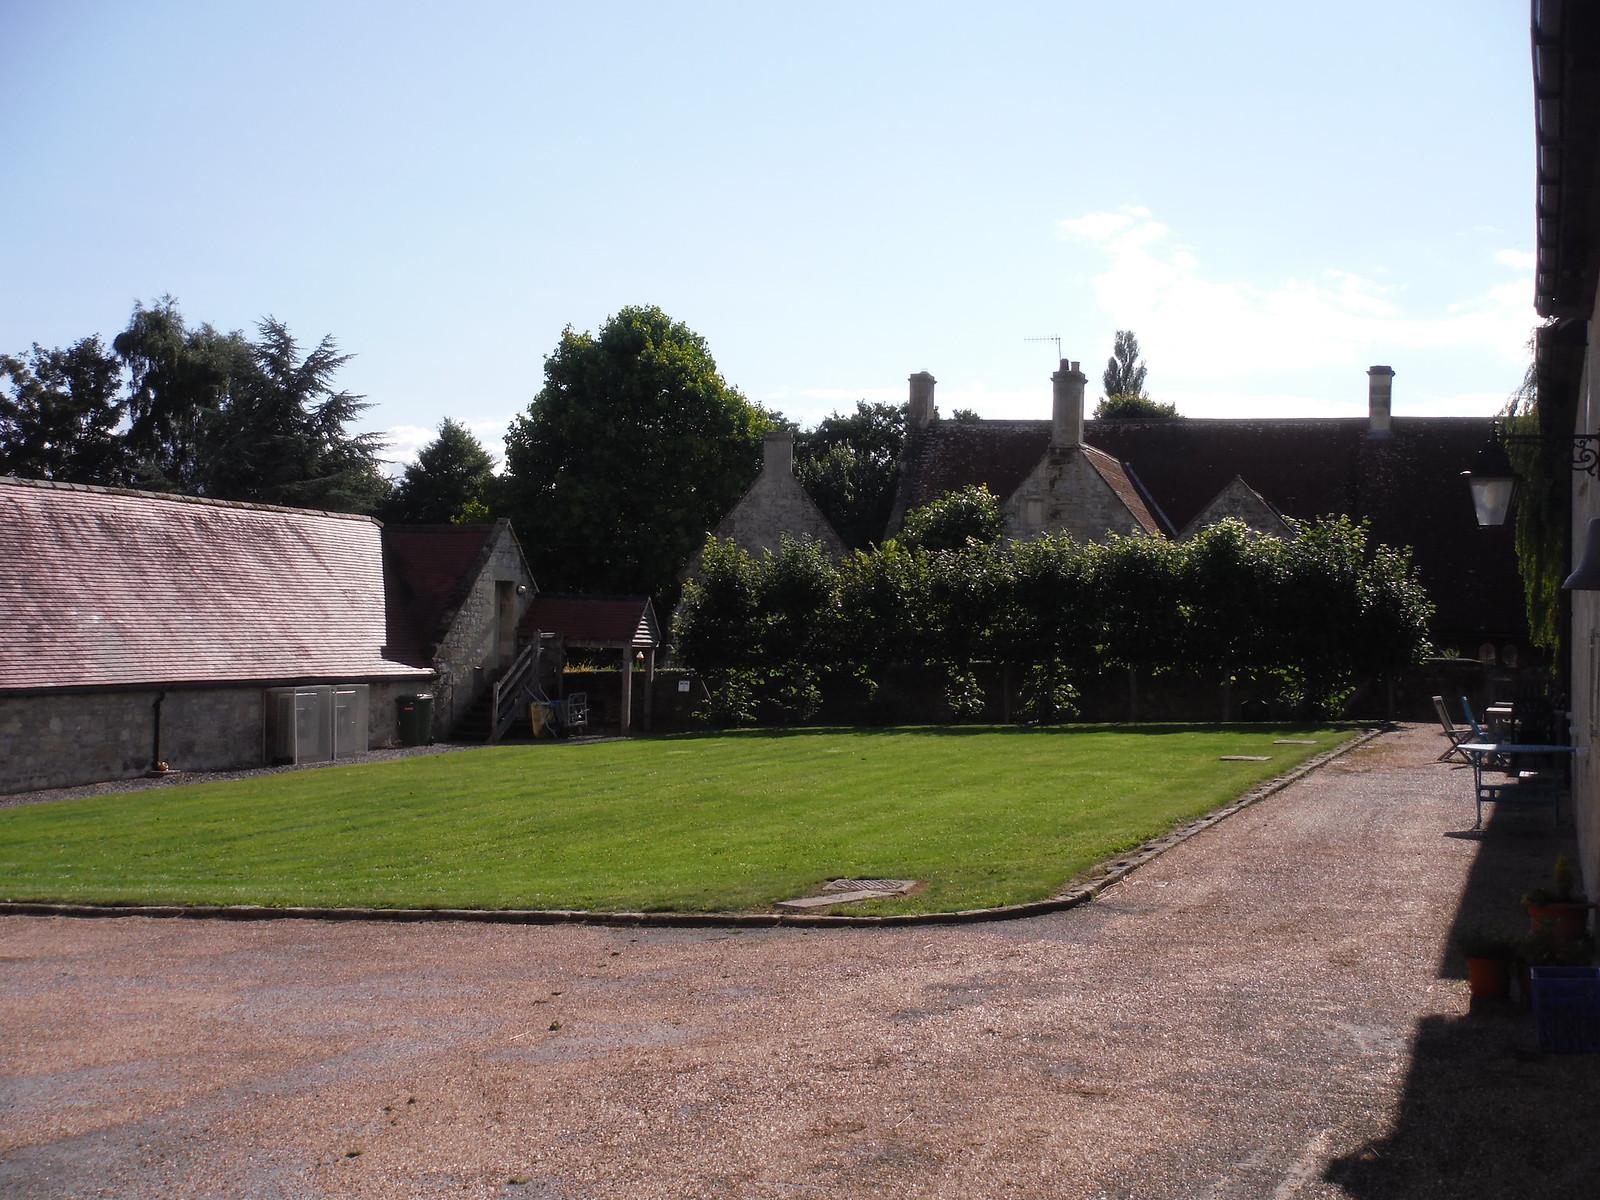 Place Farm, Tisbury, Courtyard SWC Walk 248 Tisbury Circular via Hindon